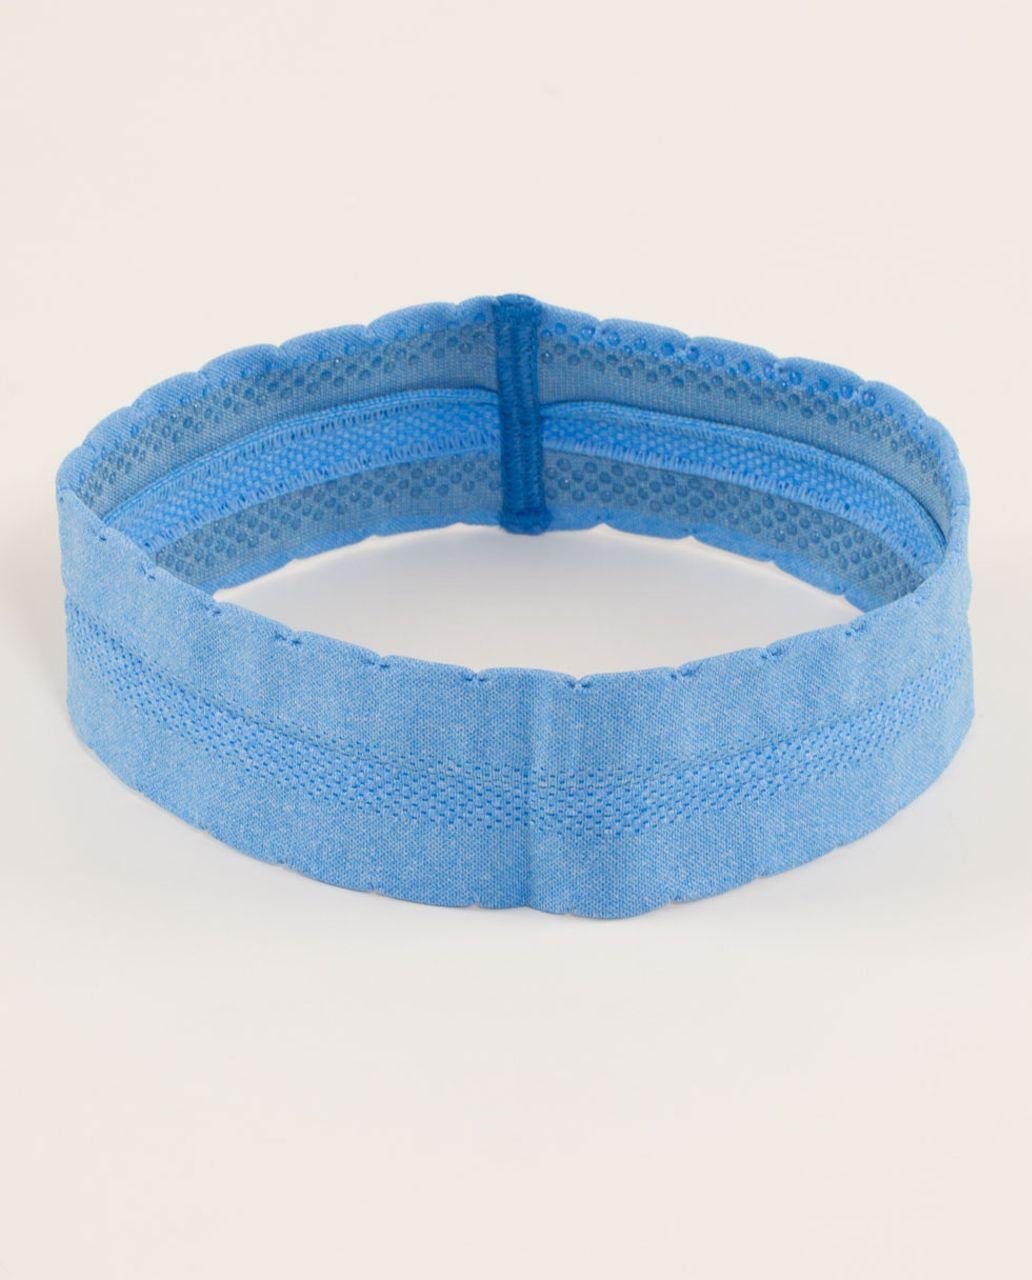 Lululemon Swiftly Headband - Beaming Blue